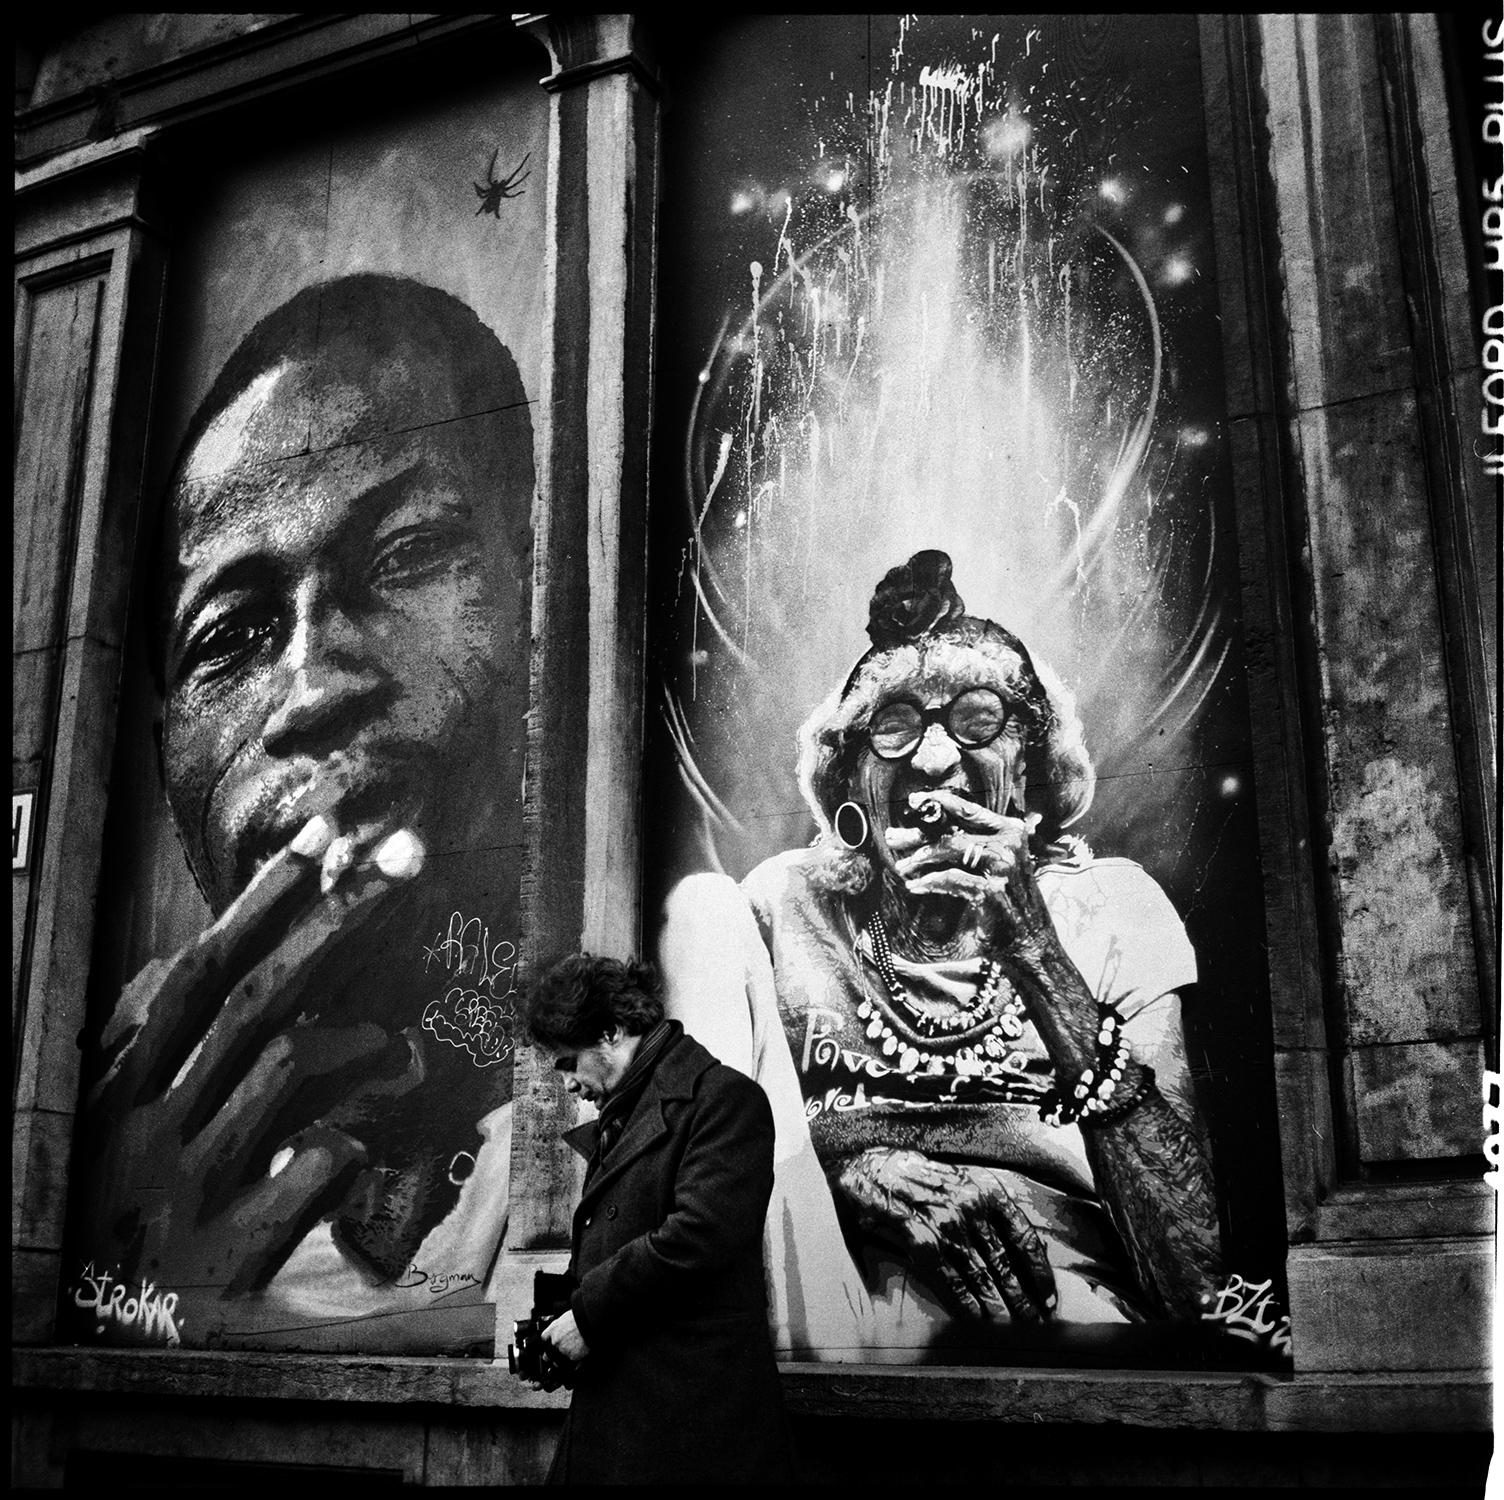 Hervé Baudat  - photography, blackandwhite - lorseau | ello